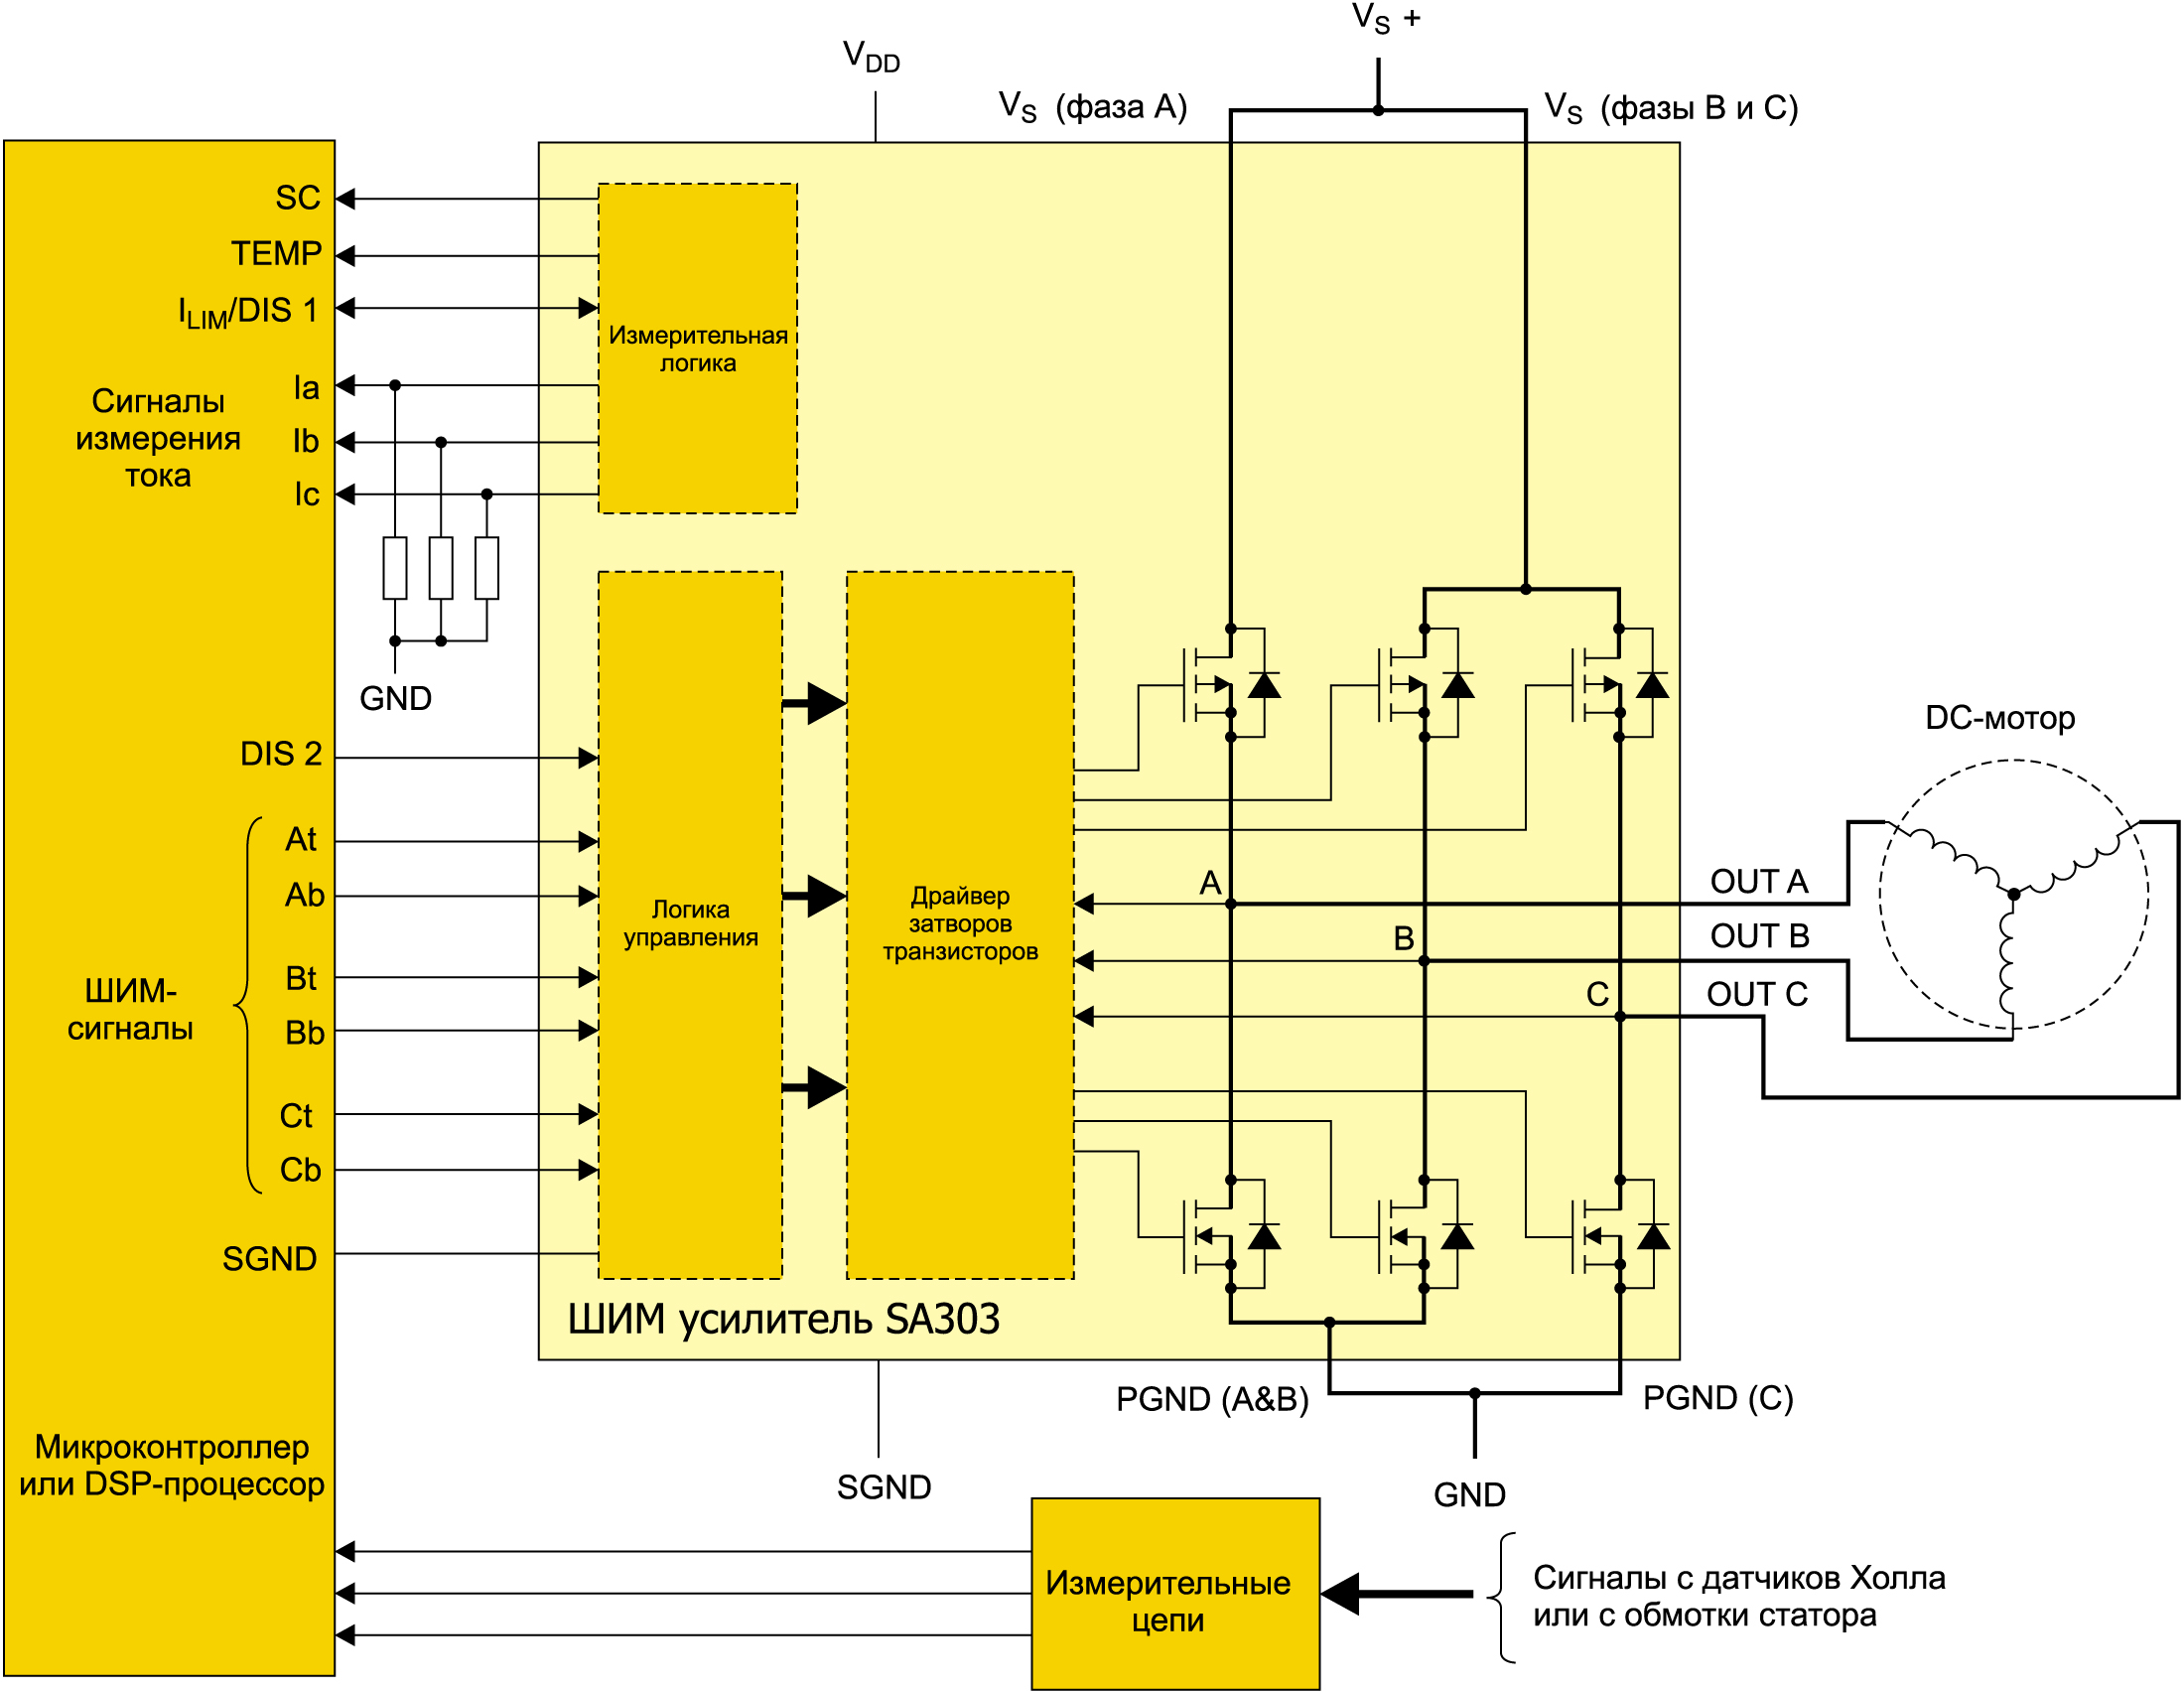 Схема подключения ШИМ-усилителя SA303